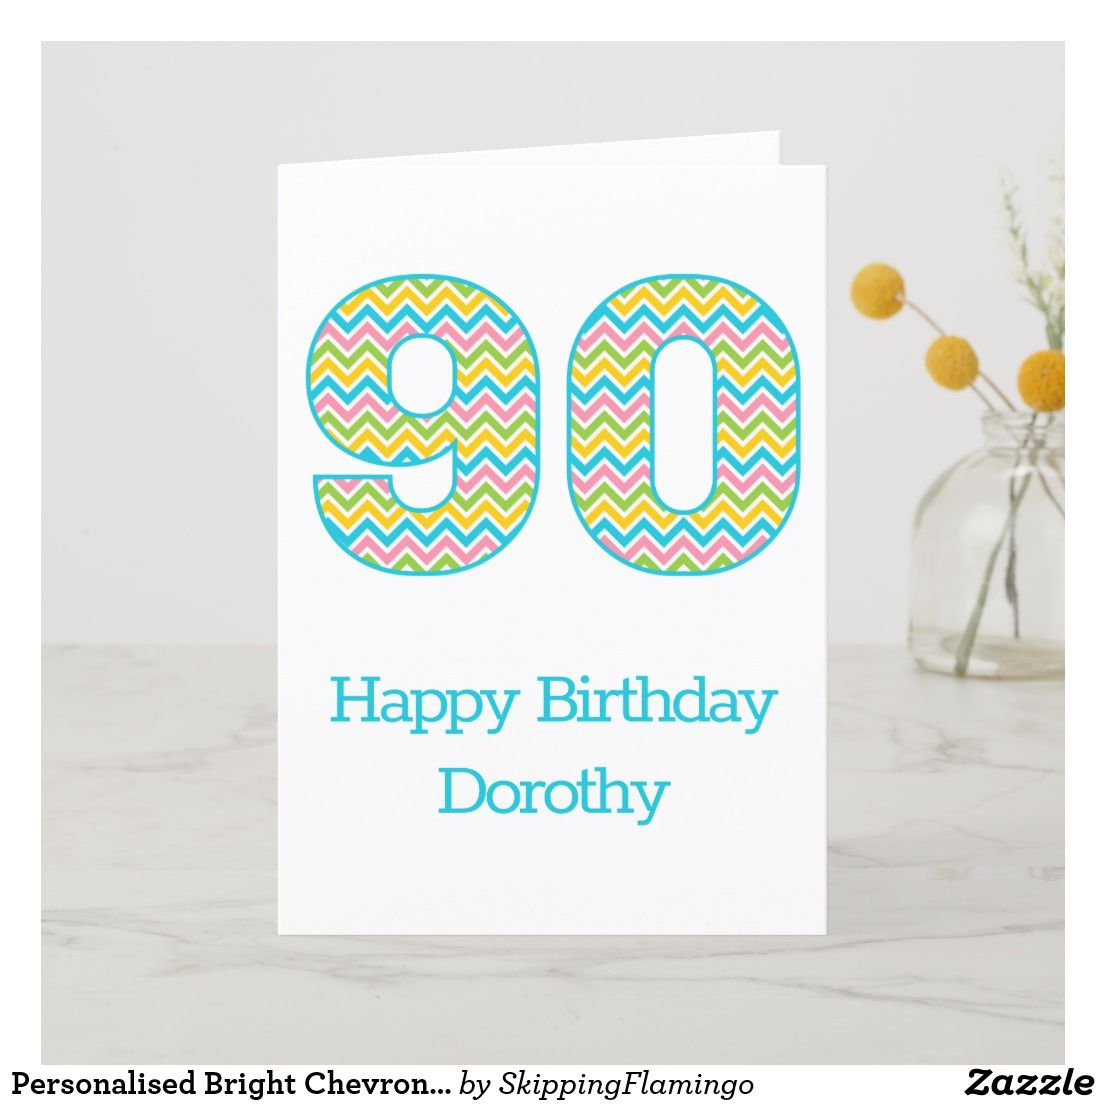 Personalized Bright Chevron 90th Birthday Card Zazzle Com 18th Birthday Cards 60th Birthday Cards 80th Birthday Cards